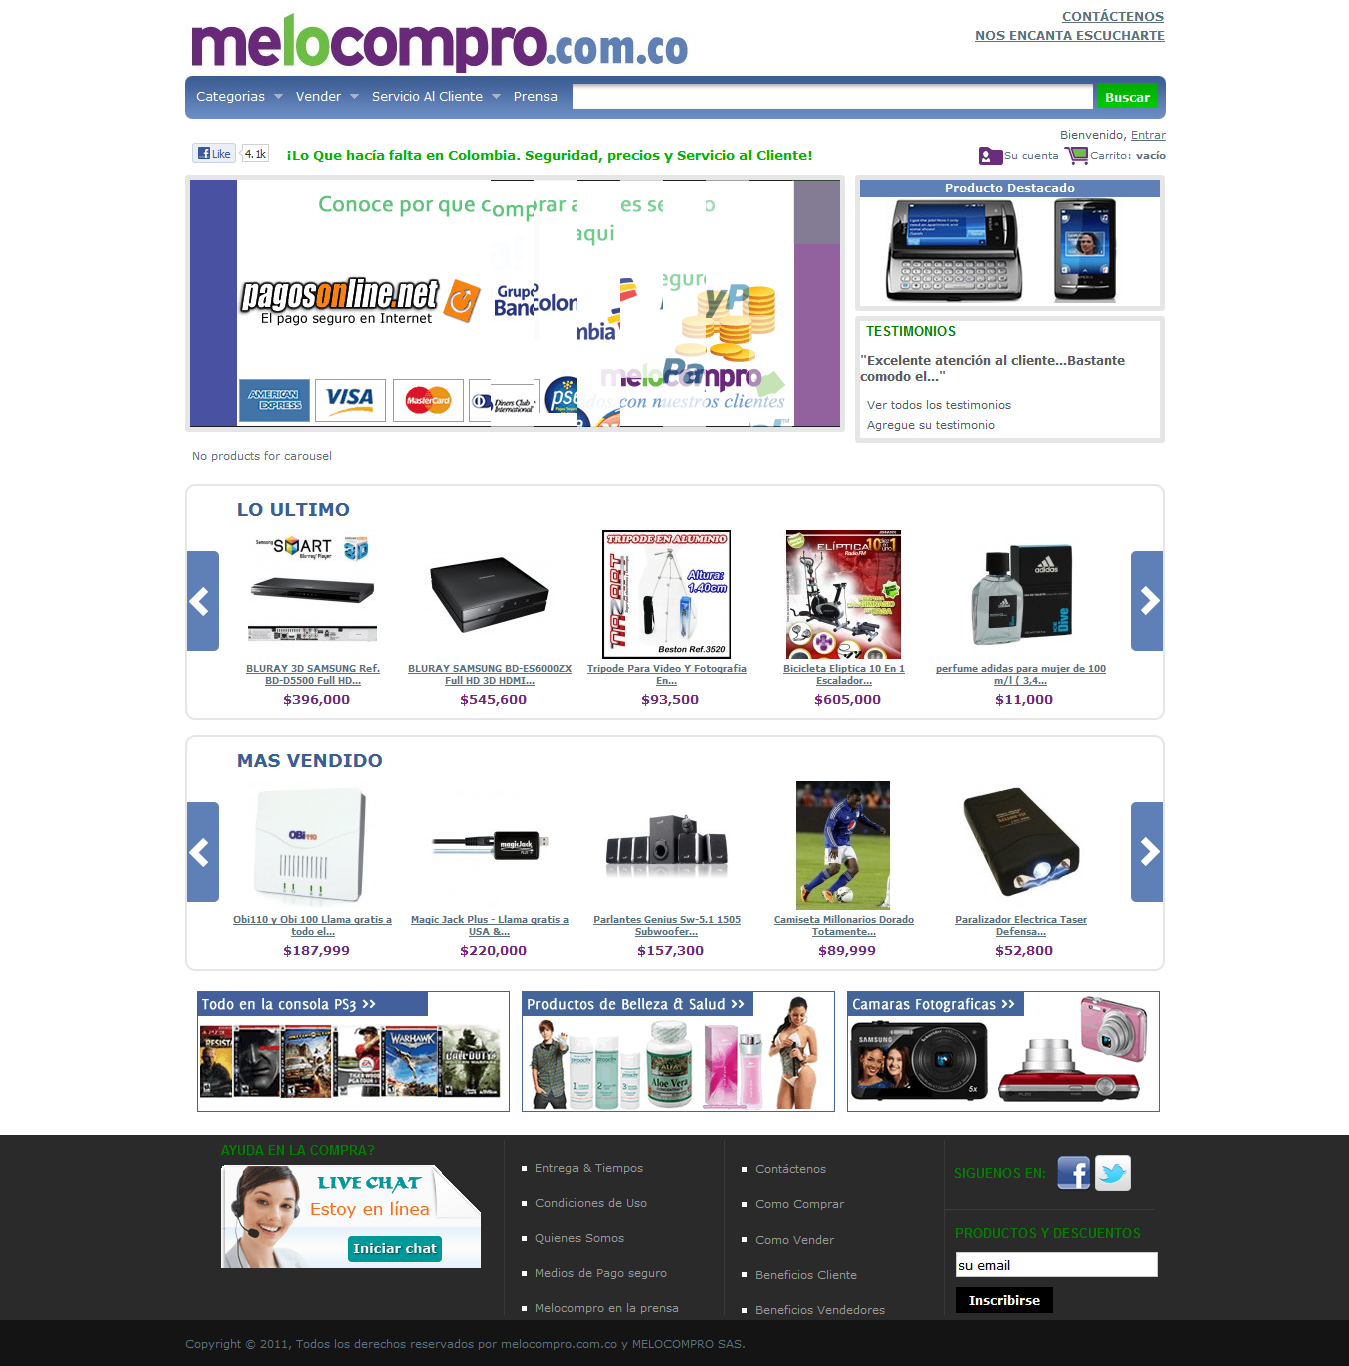 Melocompro